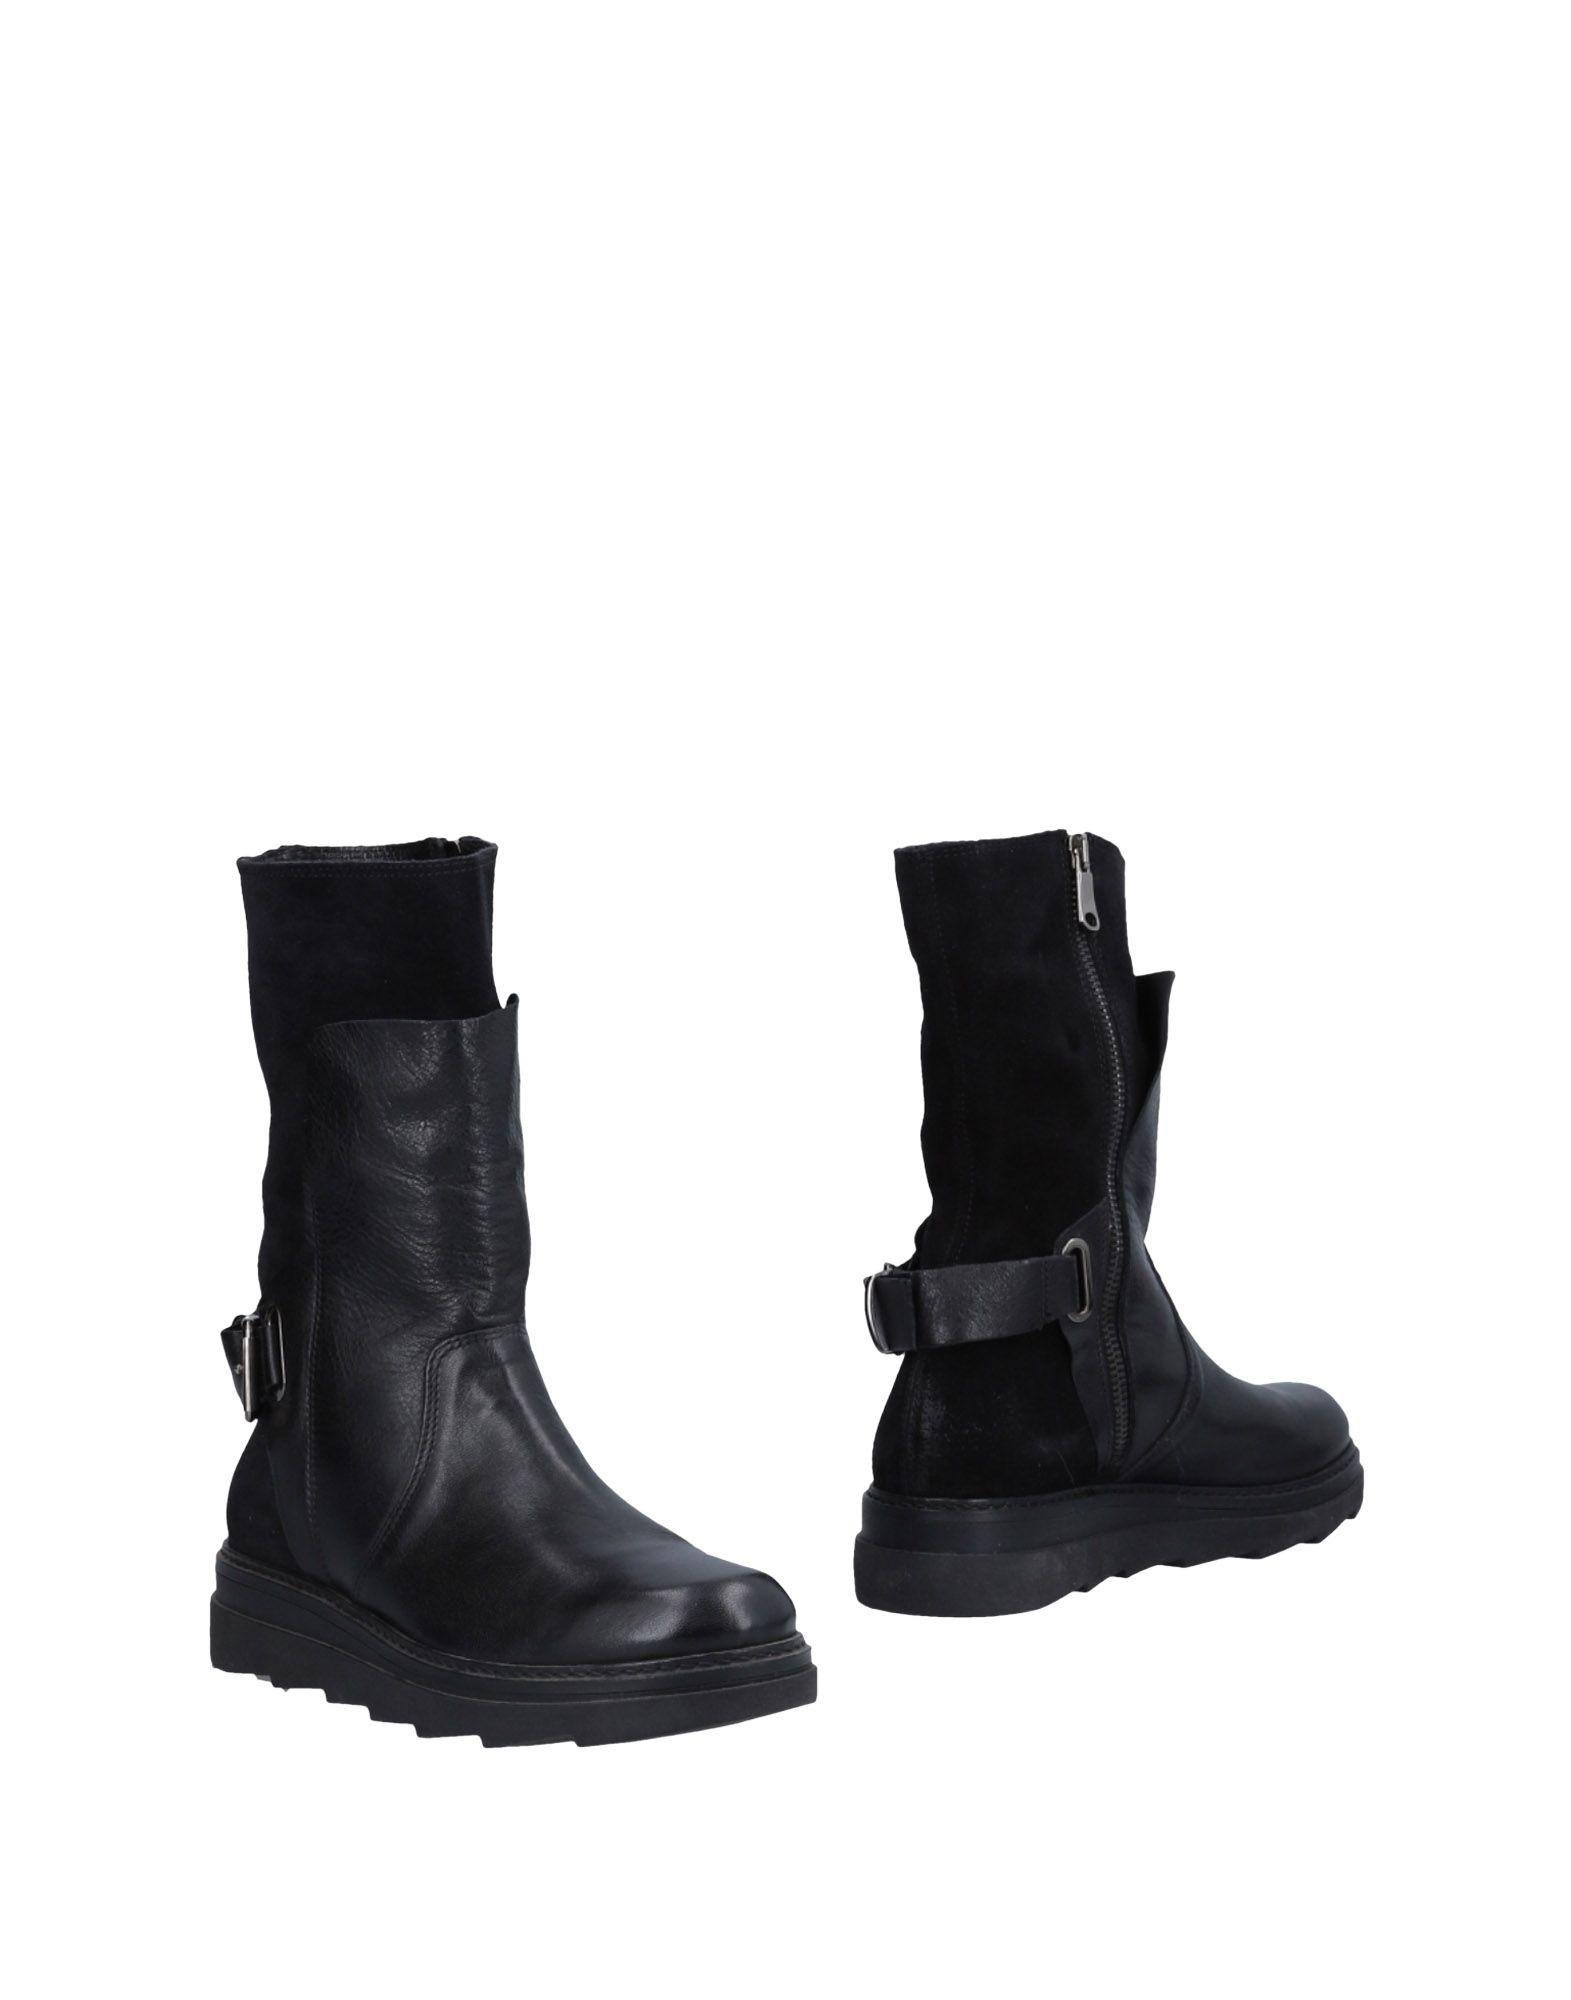 Keb Keb Ankle Boot - Women Keb Keb Ankle Boots online on  Australia - 11489060MN 21c14b